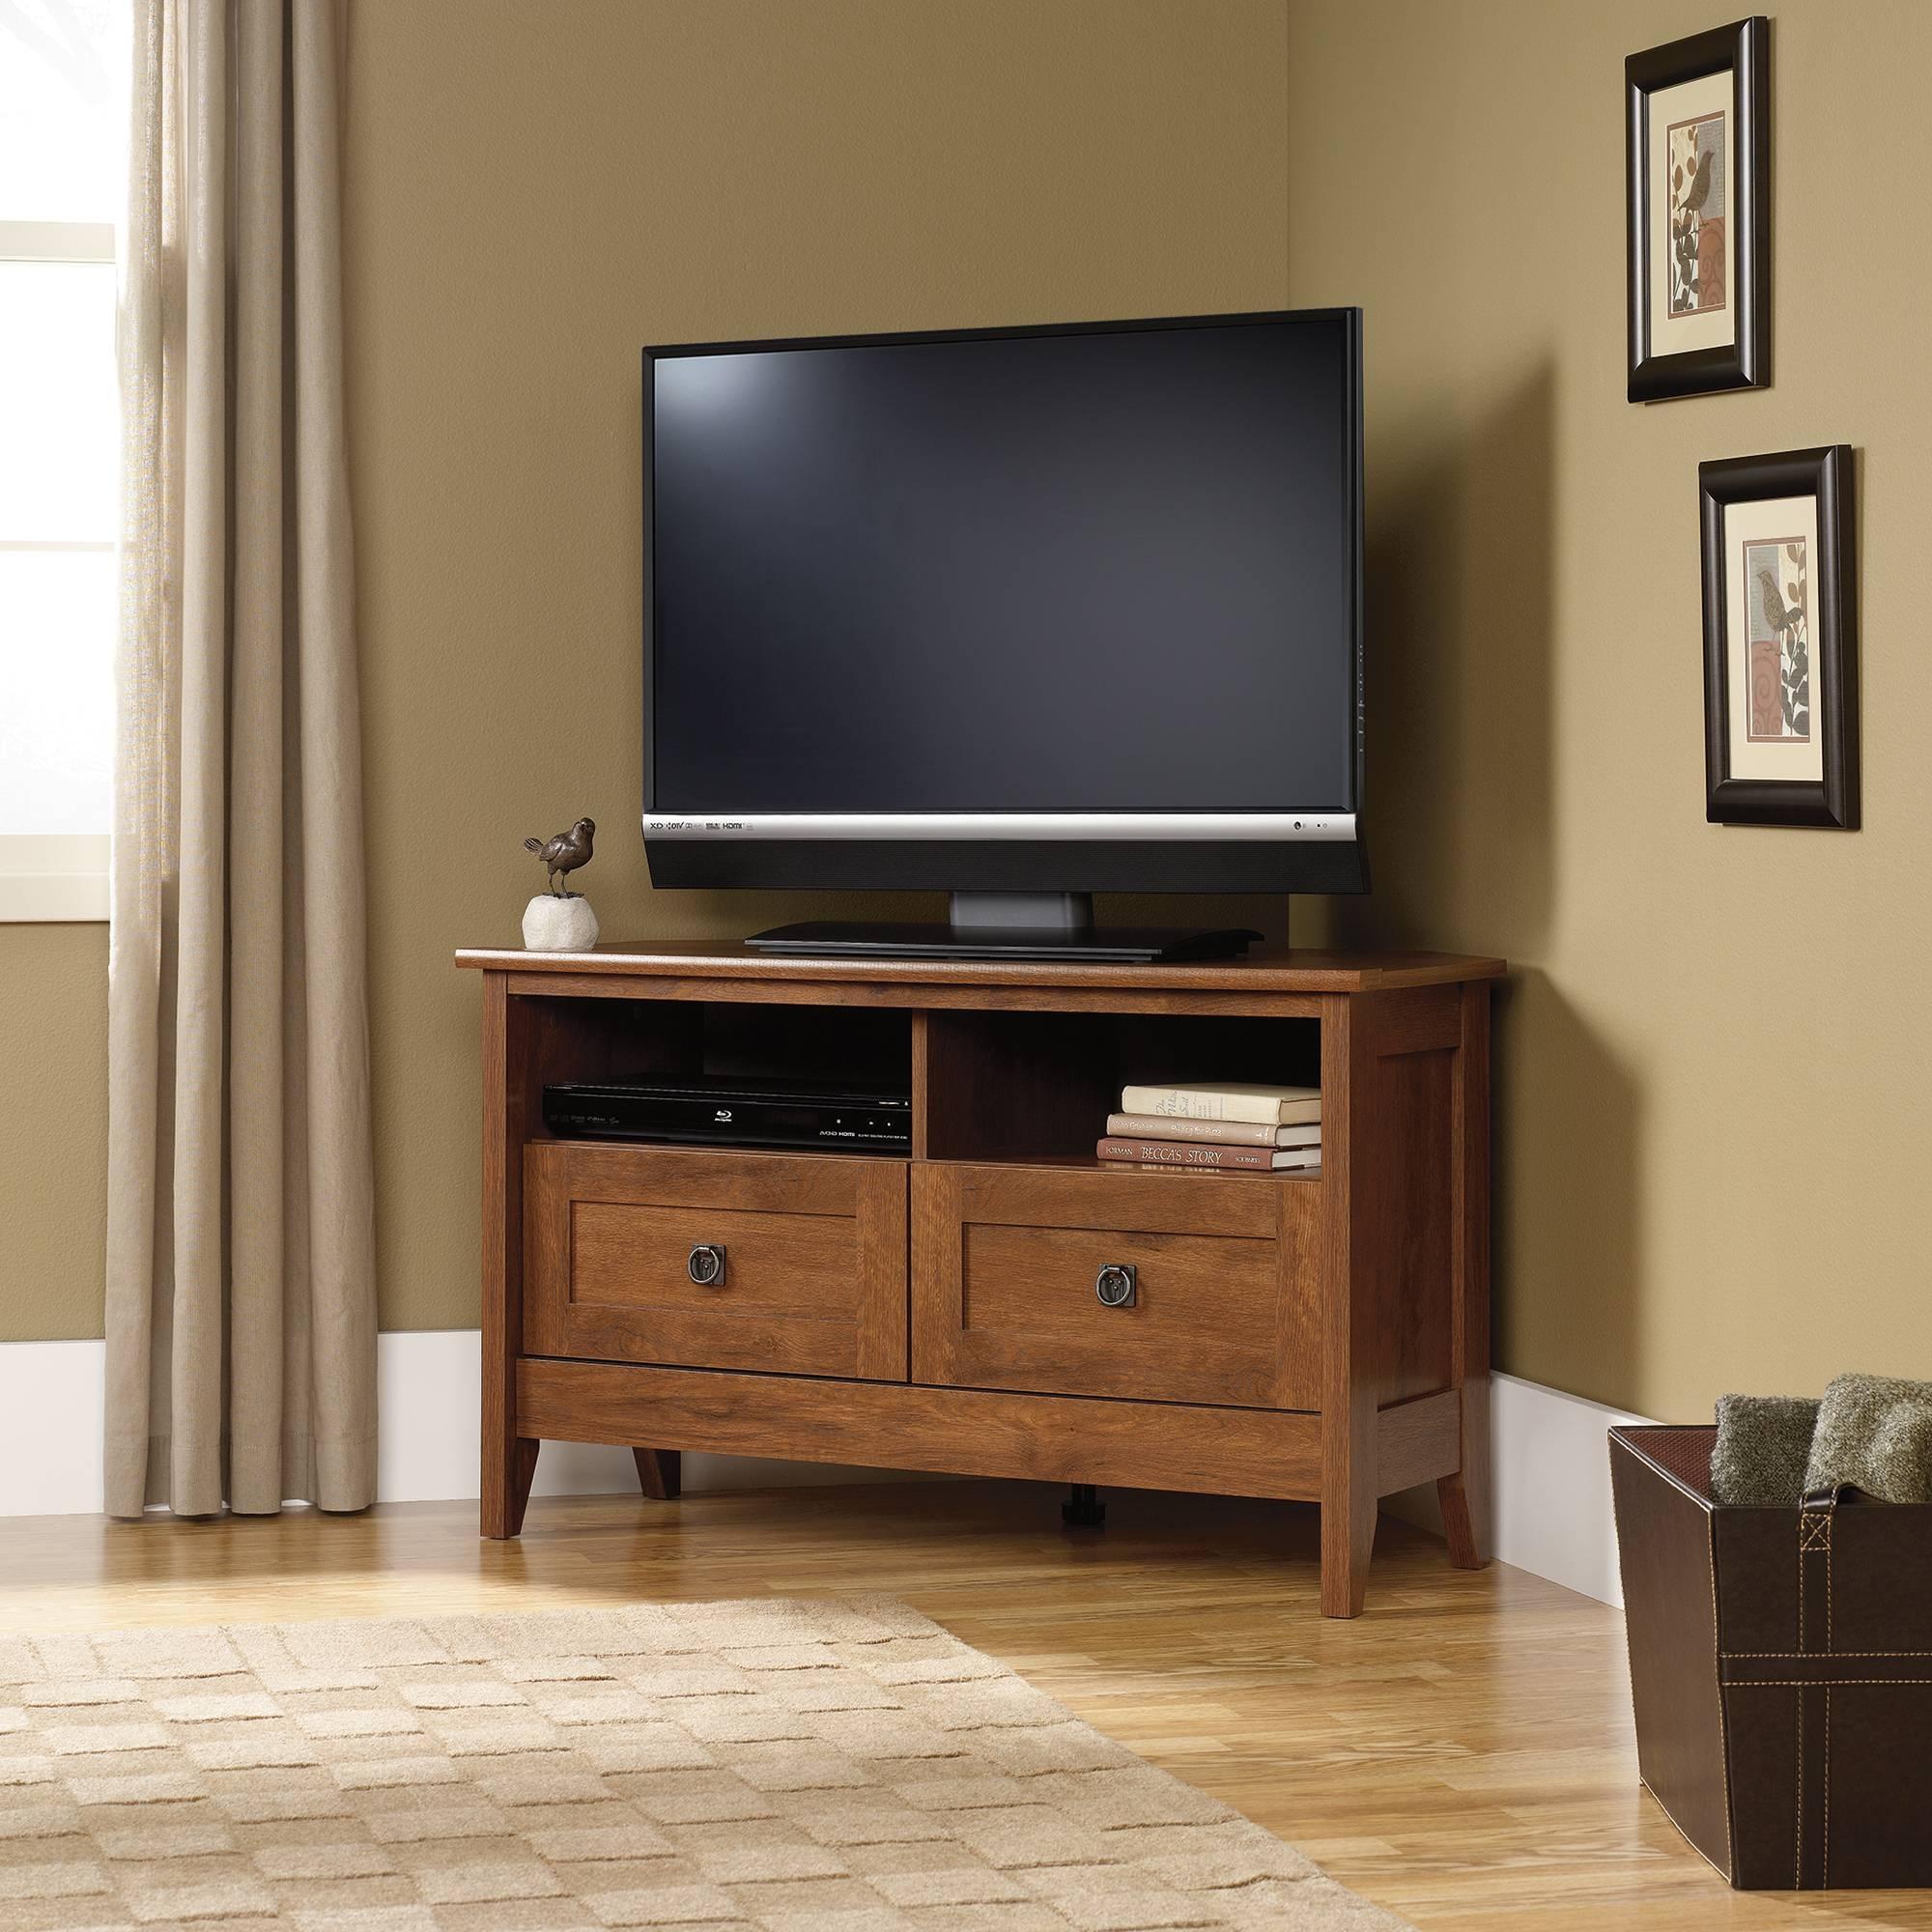 Sauder Select | Corner Tv Stand | 410627 | Sauder throughout 24 Inch Corner Tv Stands (Image 6 of 15)